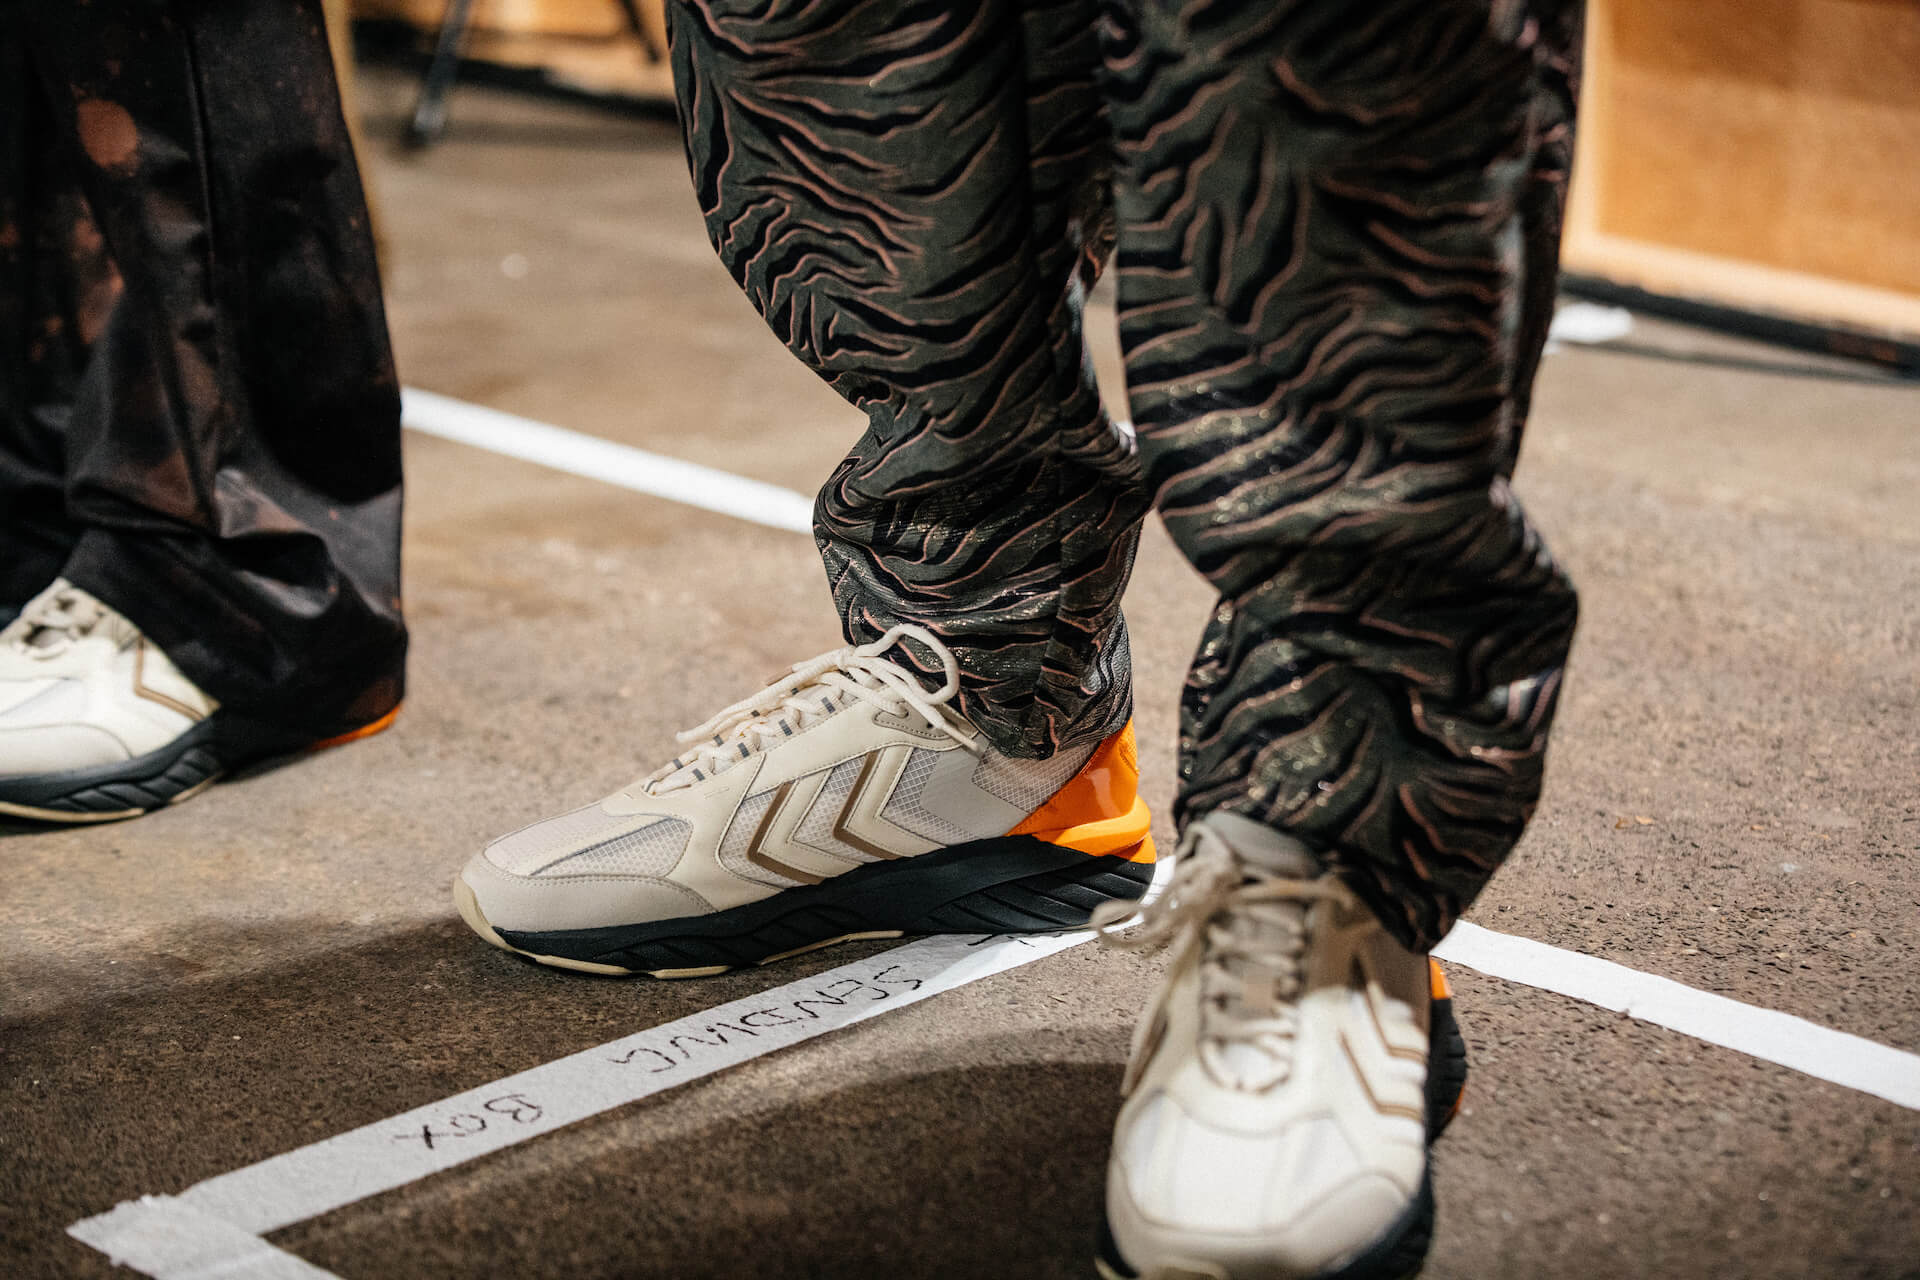 HUMMEL HIVEとASTRID ANDERSENのコラボスニーカーが東京・上野のmita sneakers限定で発売! lf200819_hummelhive_astritandersen_03